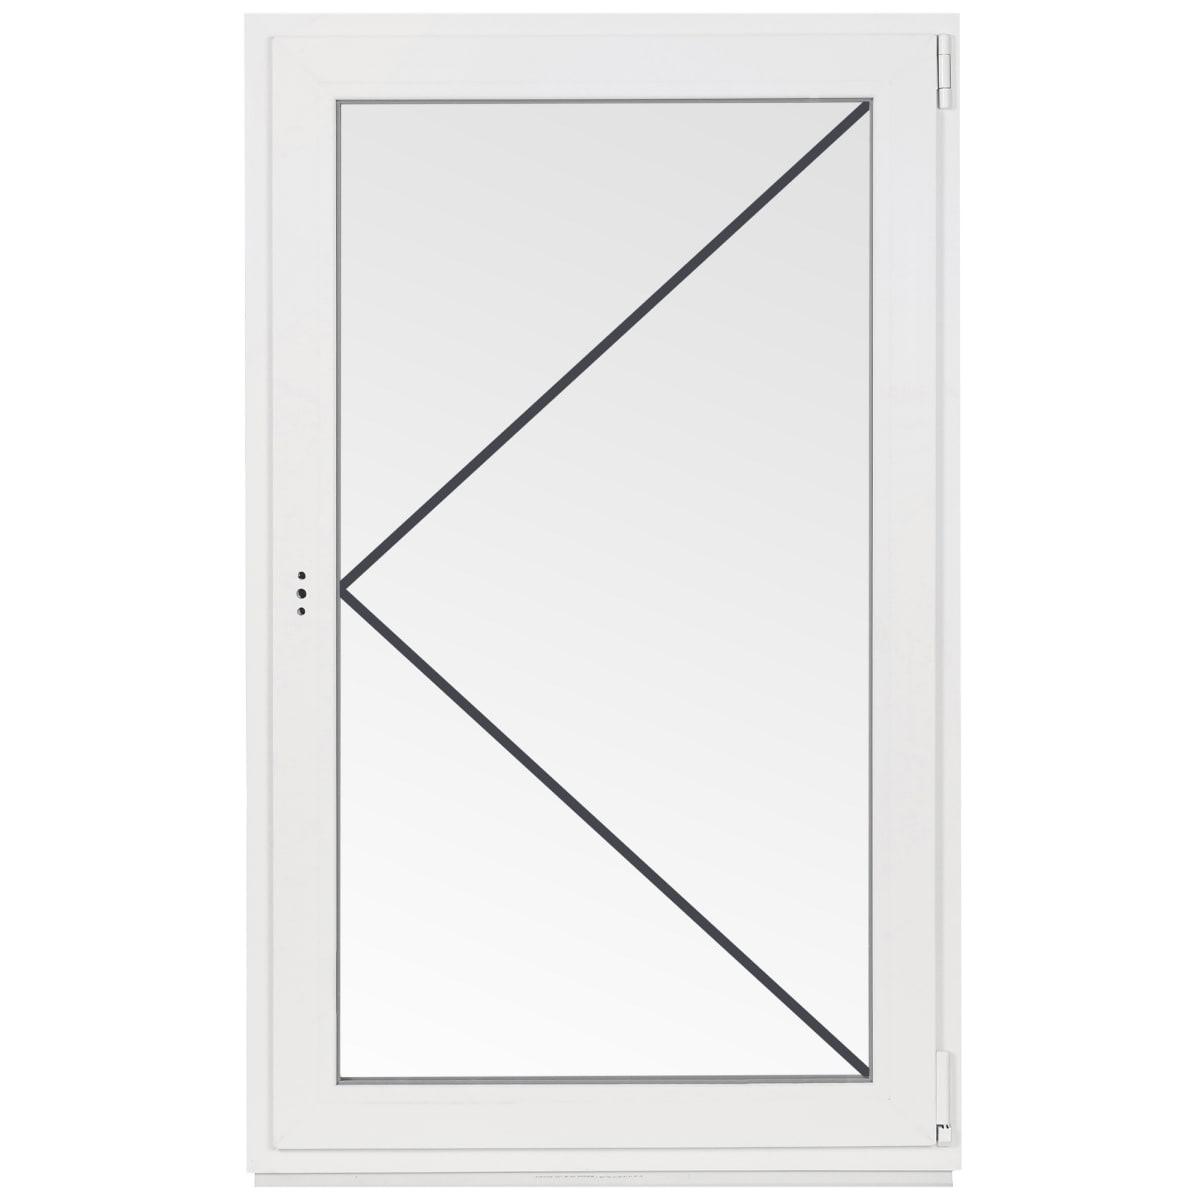 Окно ПВХ одностворчатое 110х70 см поворотное правое